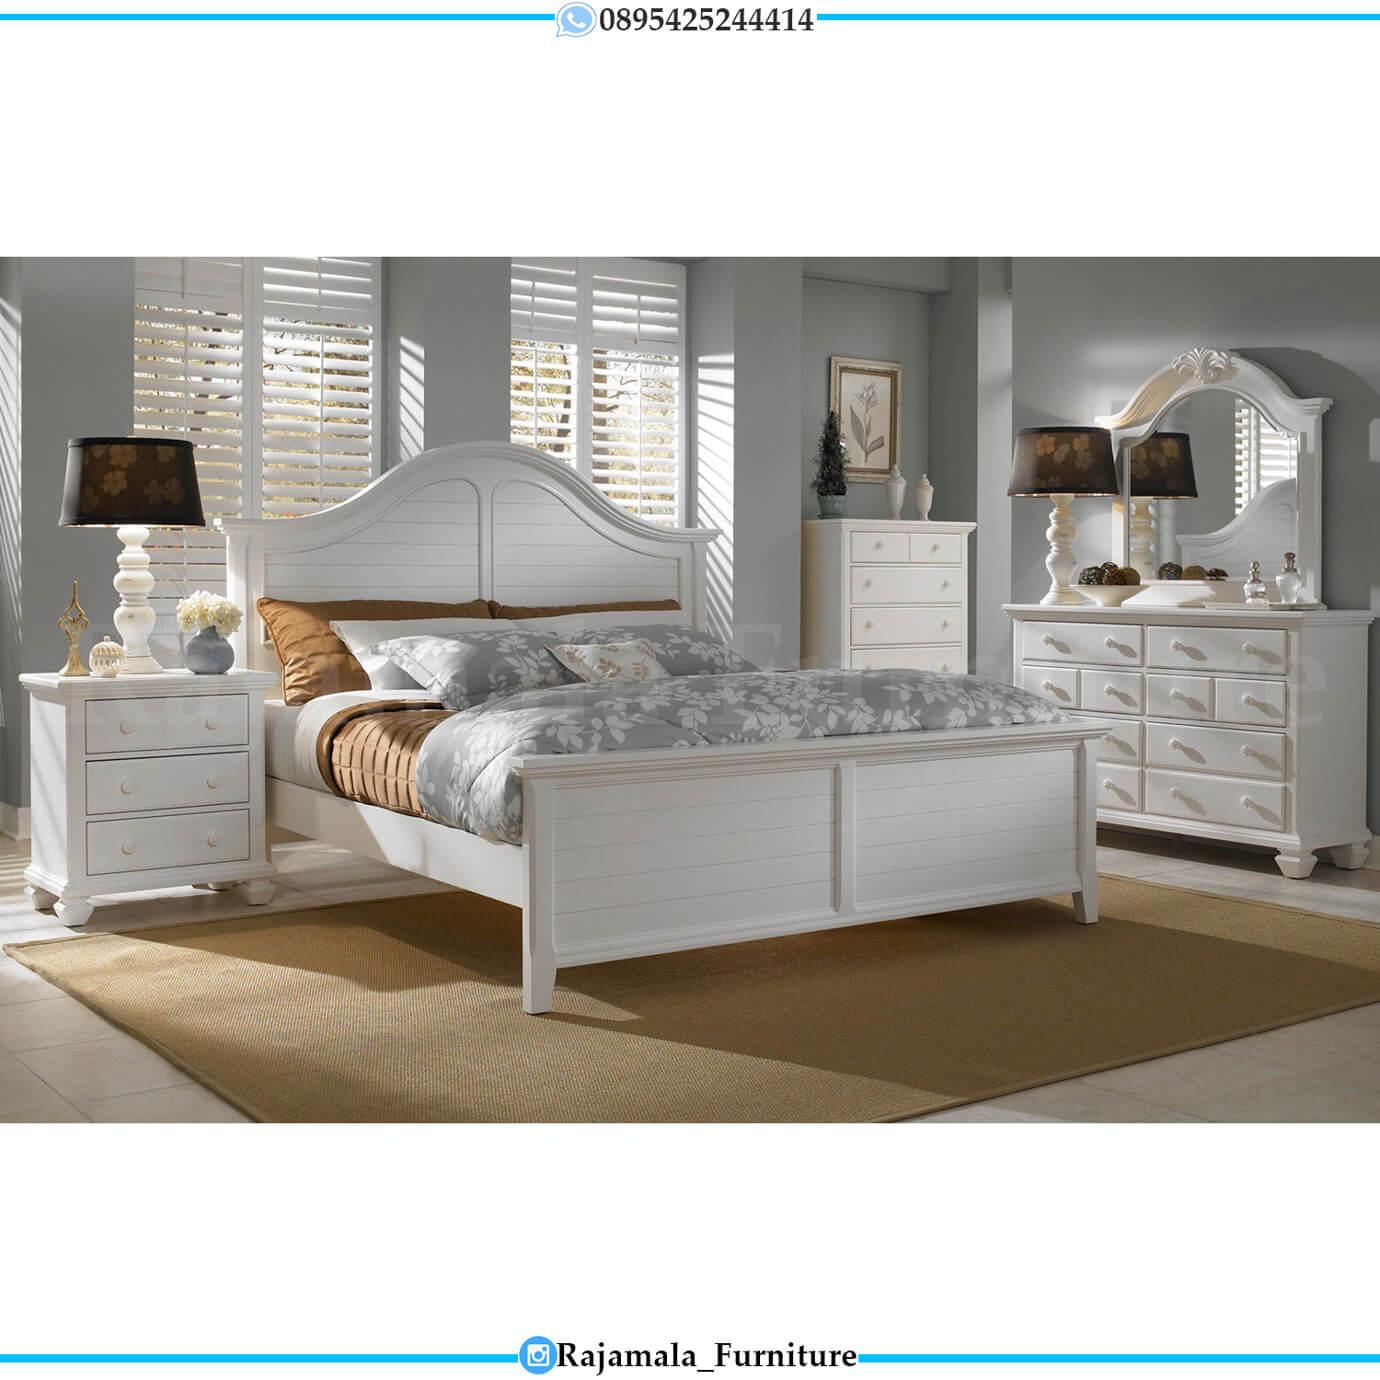 New Tempat Tidur Minimalis Terbaru Luxury Classic Furniture Jepara Update RM-0218